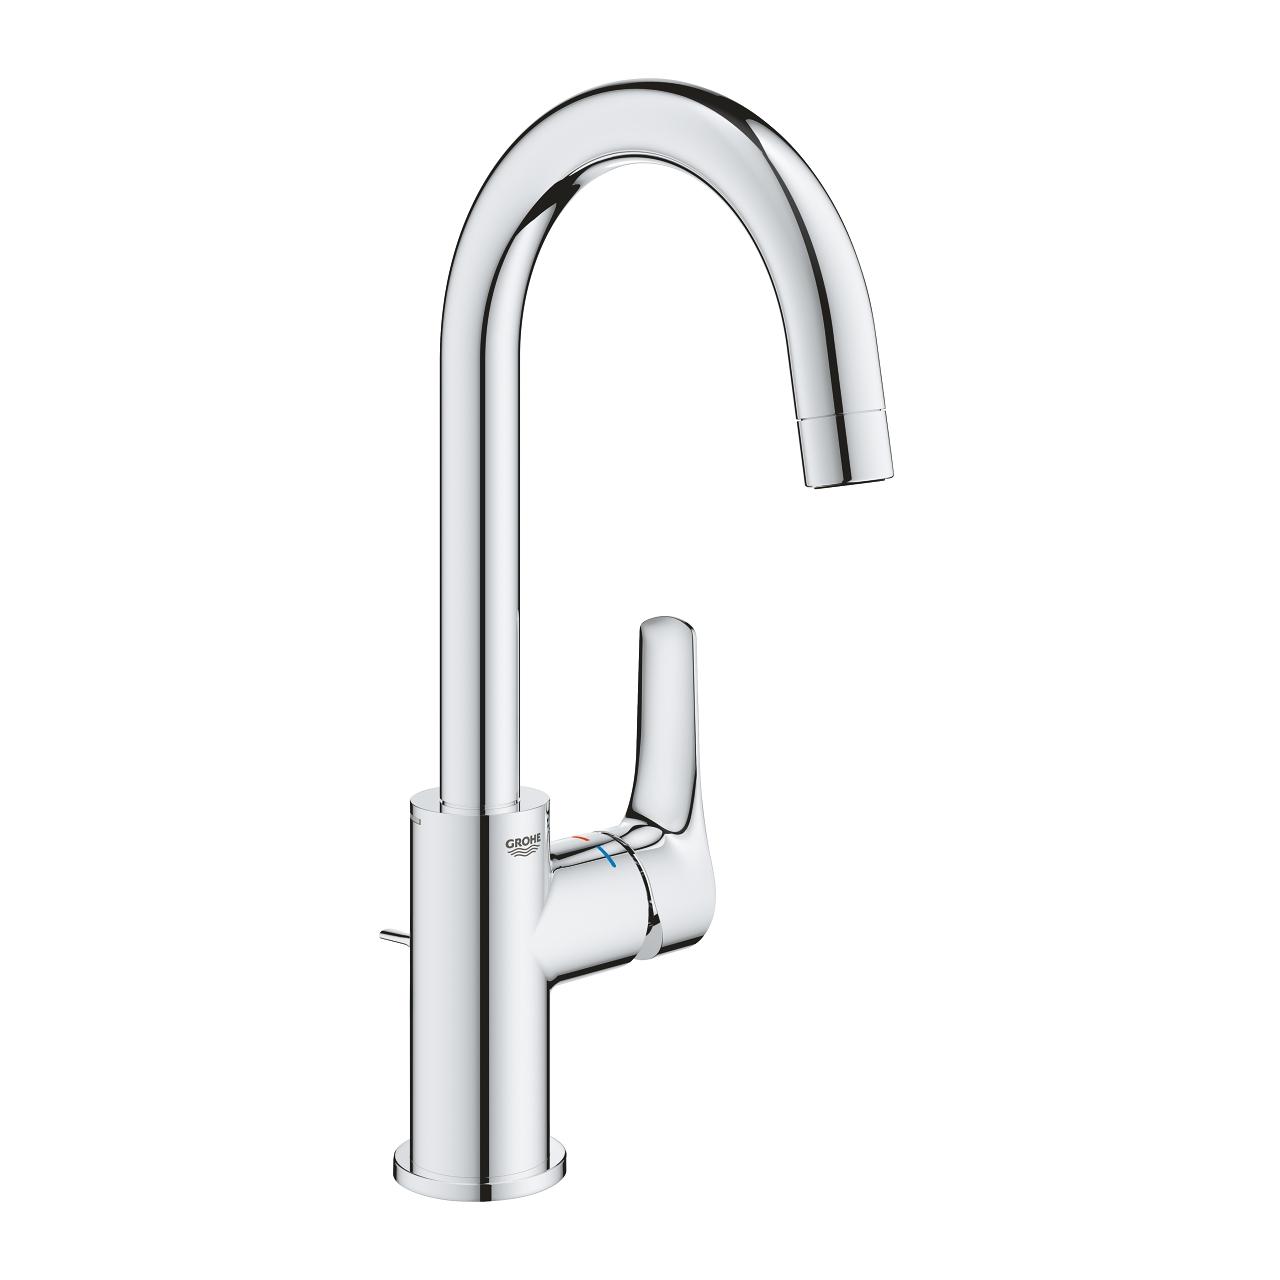 Mitigeur lavabo Eurosmart - Taille L Grohe